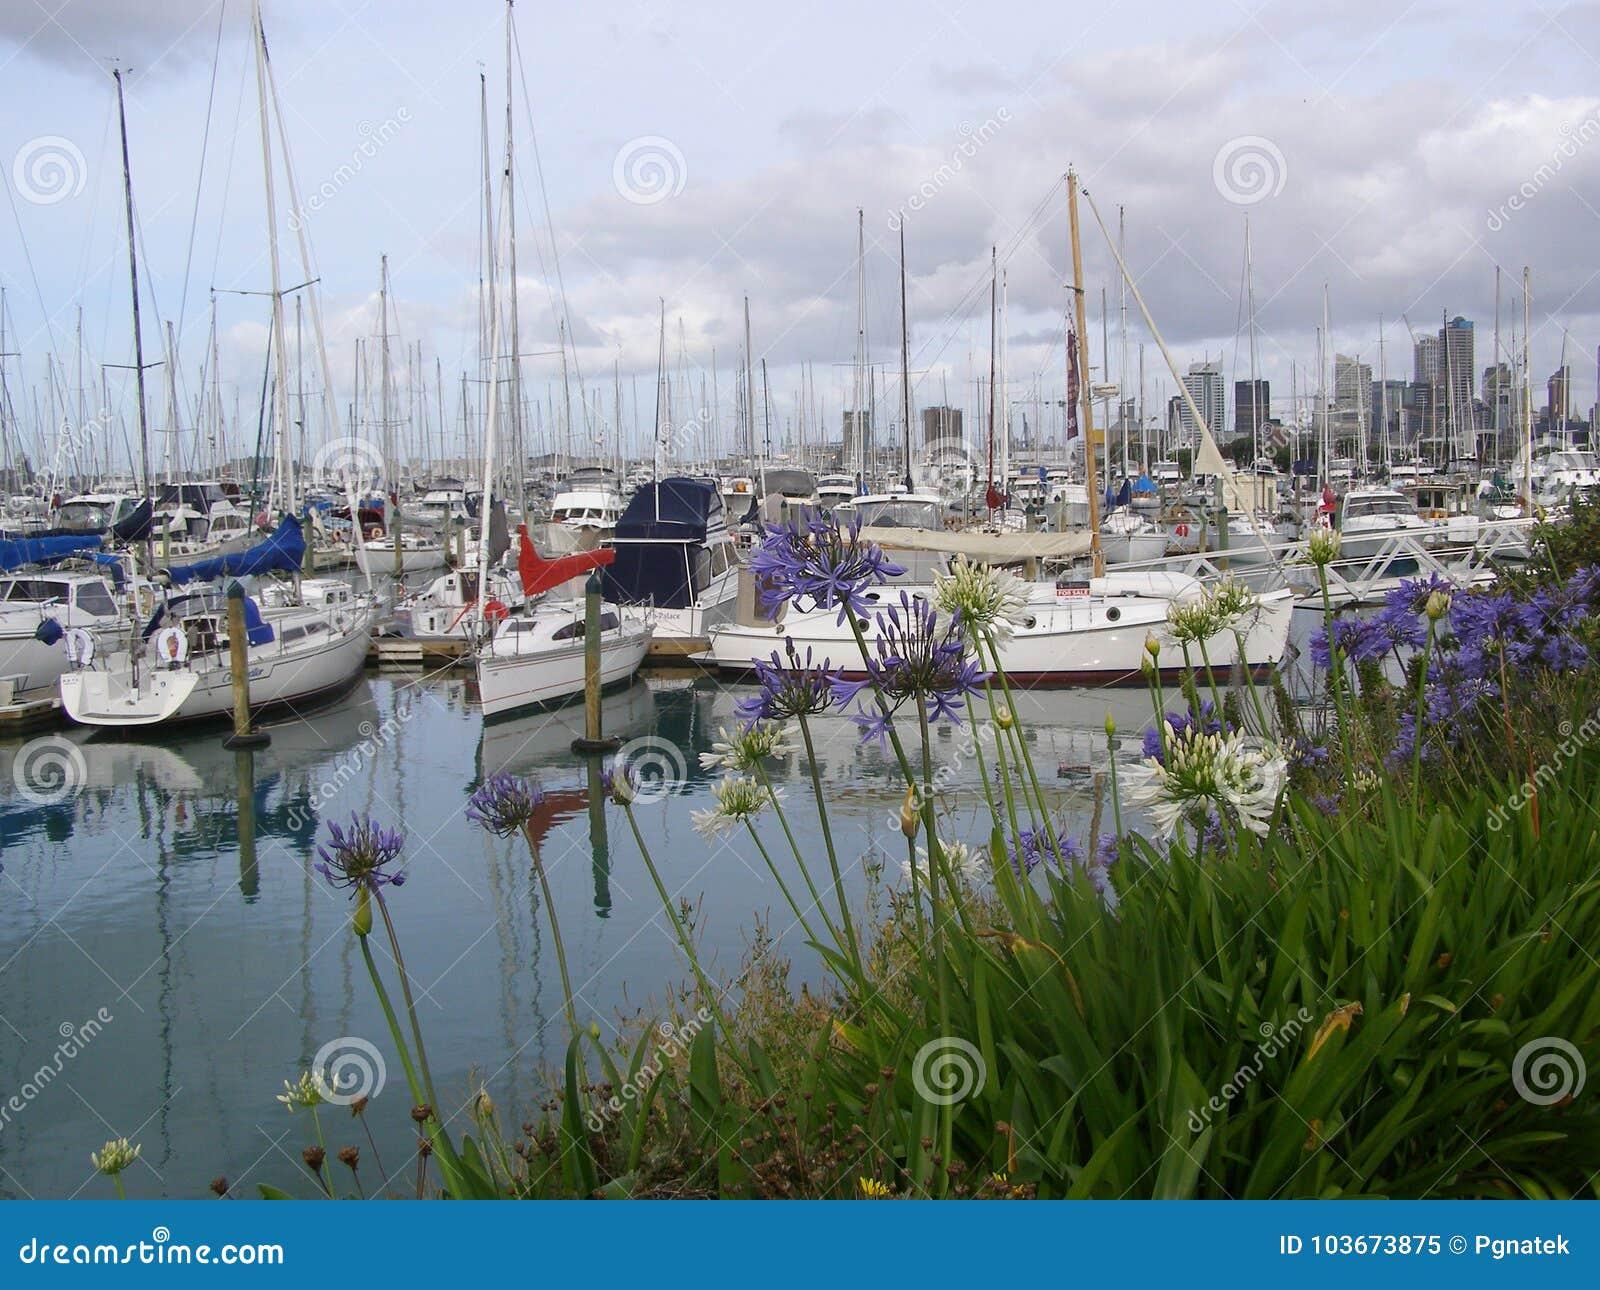 Westhaven Marina Auckland New Zealand